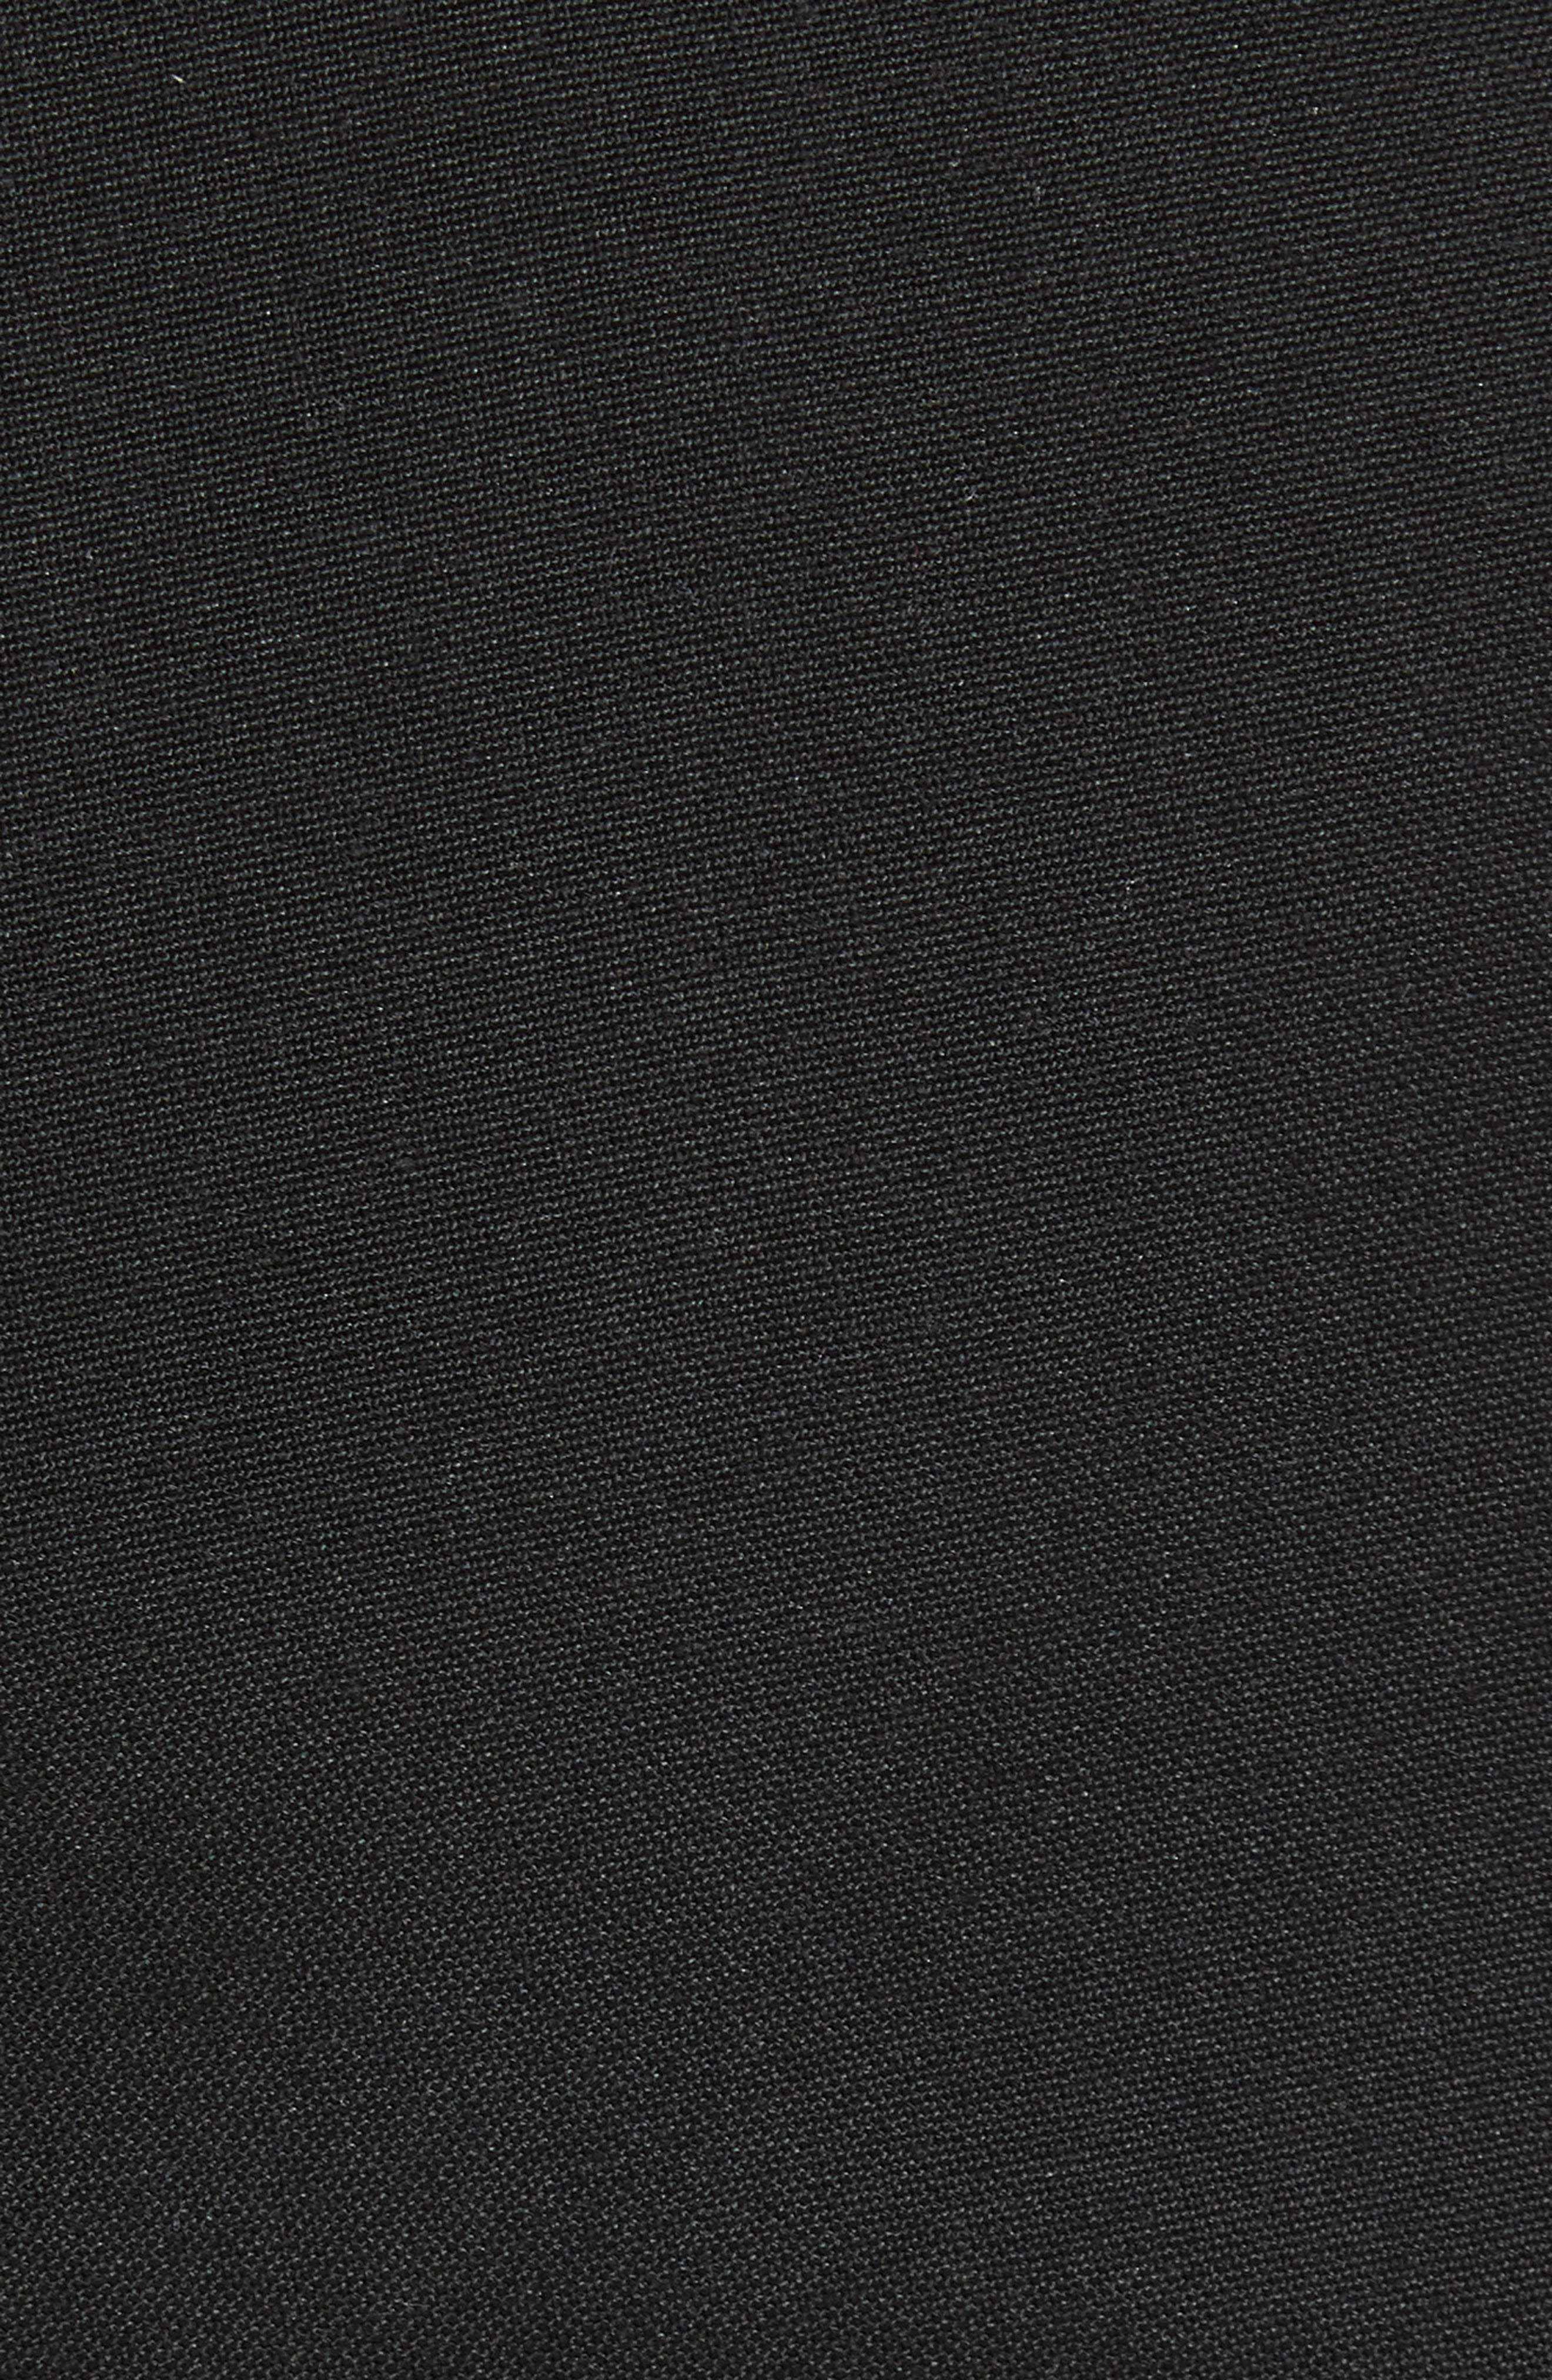 Skinny Fit Suit Pants,                             Alternate thumbnail 5, color,                             Black